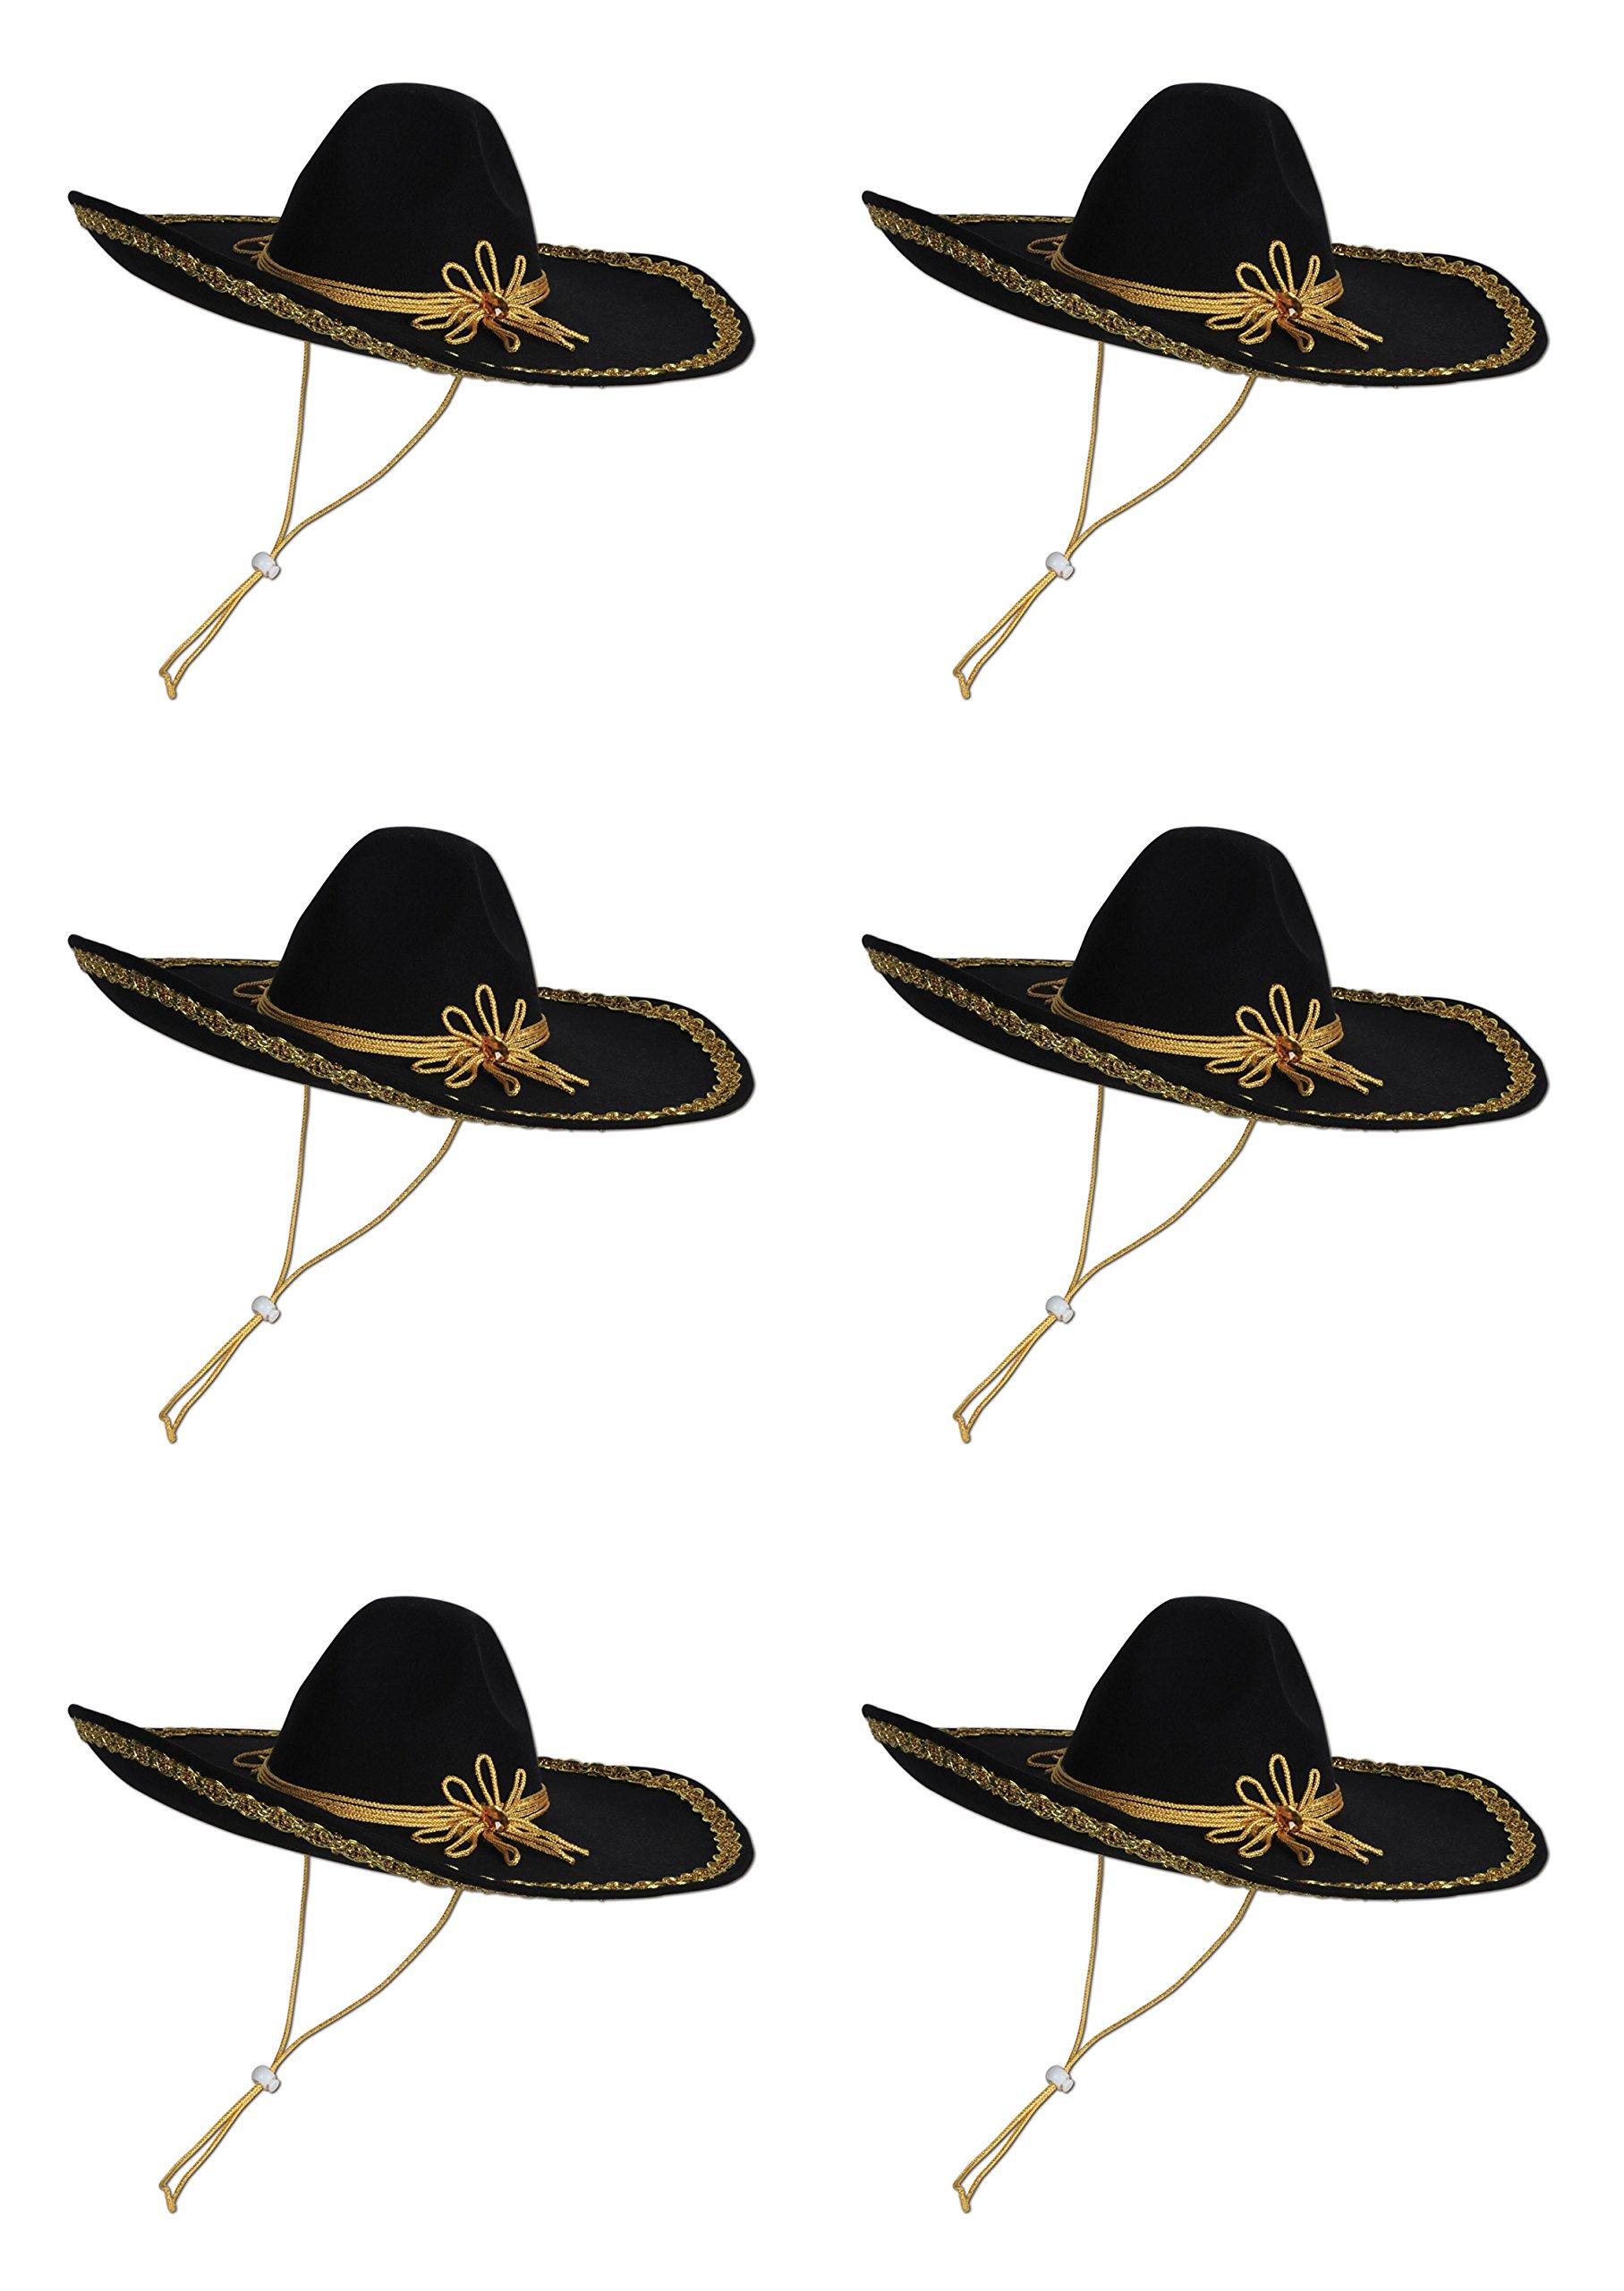 Beistle 60624 6-Pack Felt Sombrero